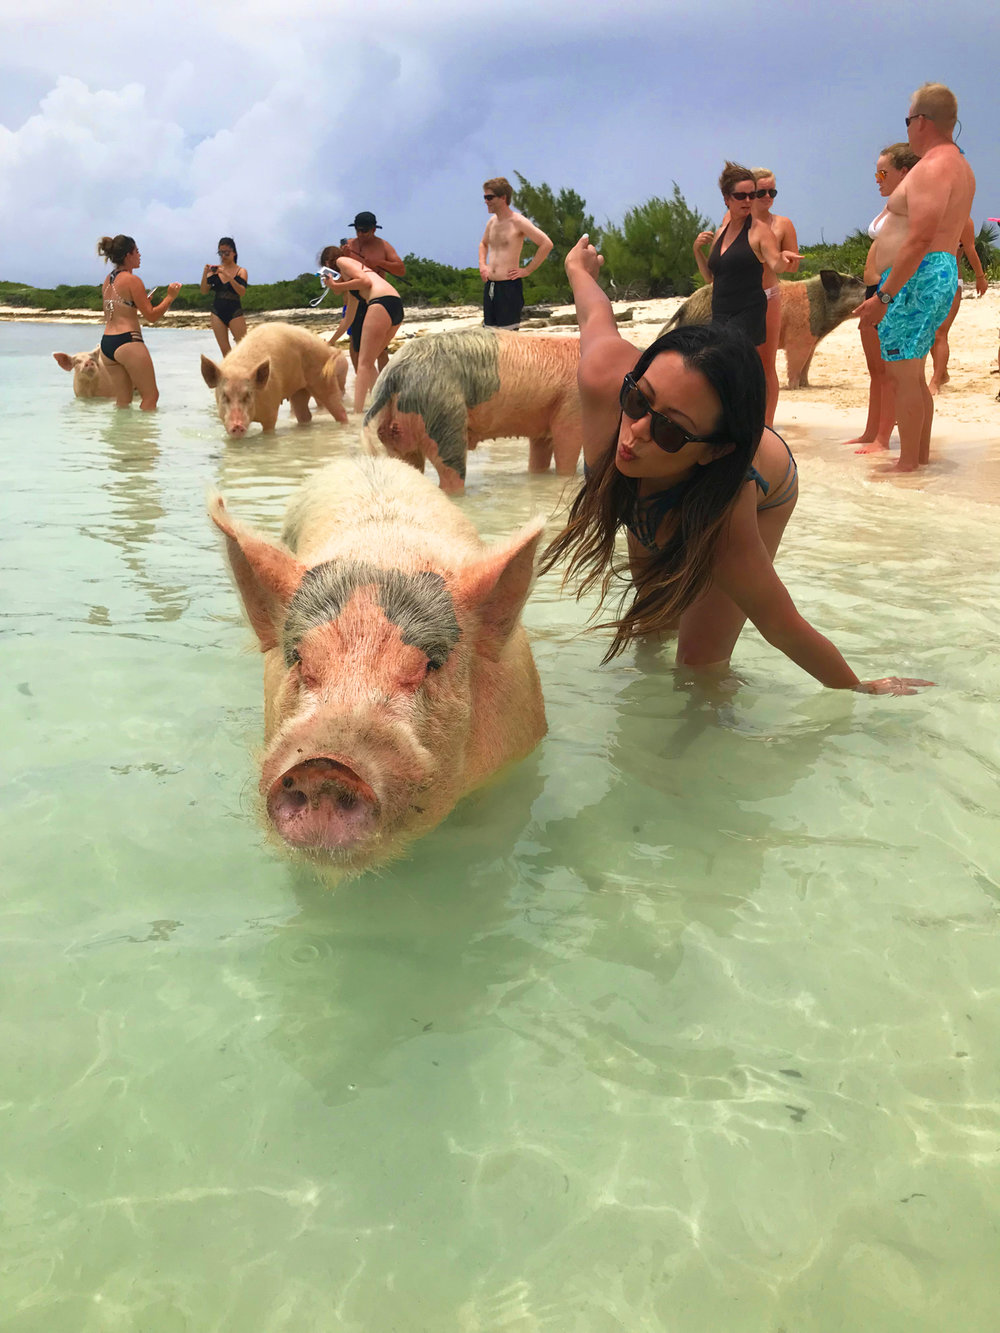 Chasing-A-Sun-Swimming-Pigs-Exuma-Bahamas-Angela-Sun-4.jpg